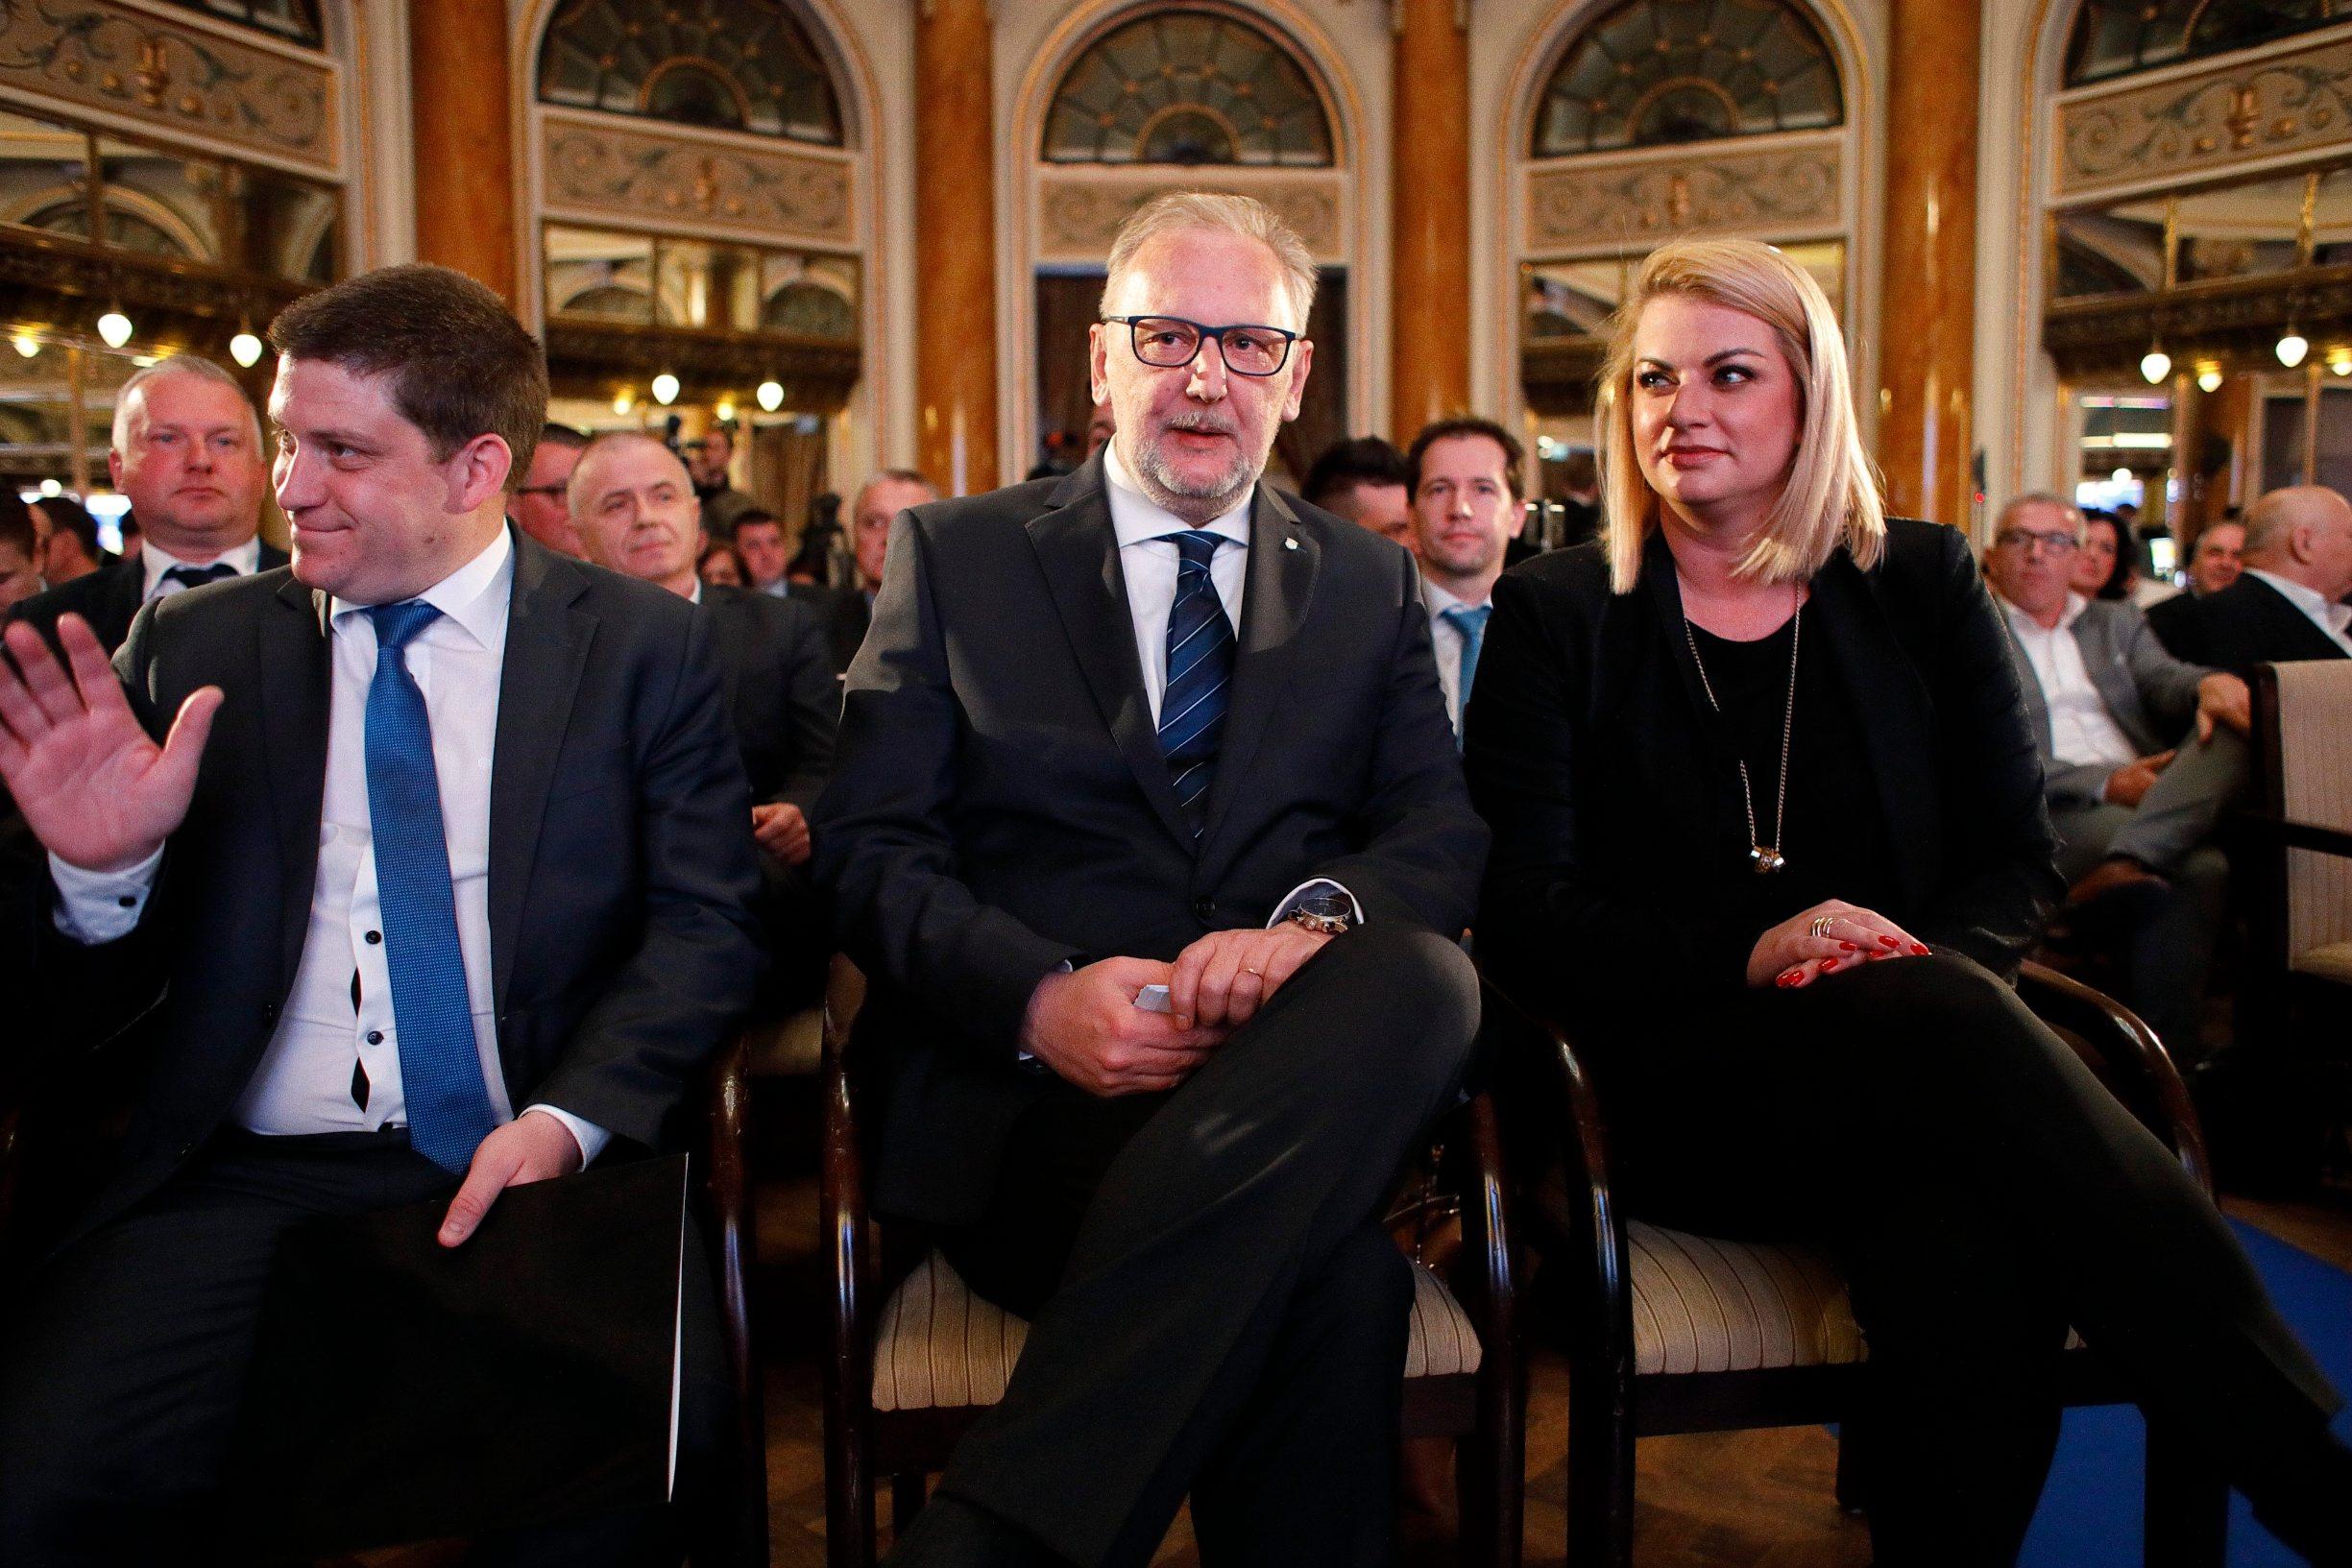 Oleg Butković, Davor Božinović, Ana Hanžeković